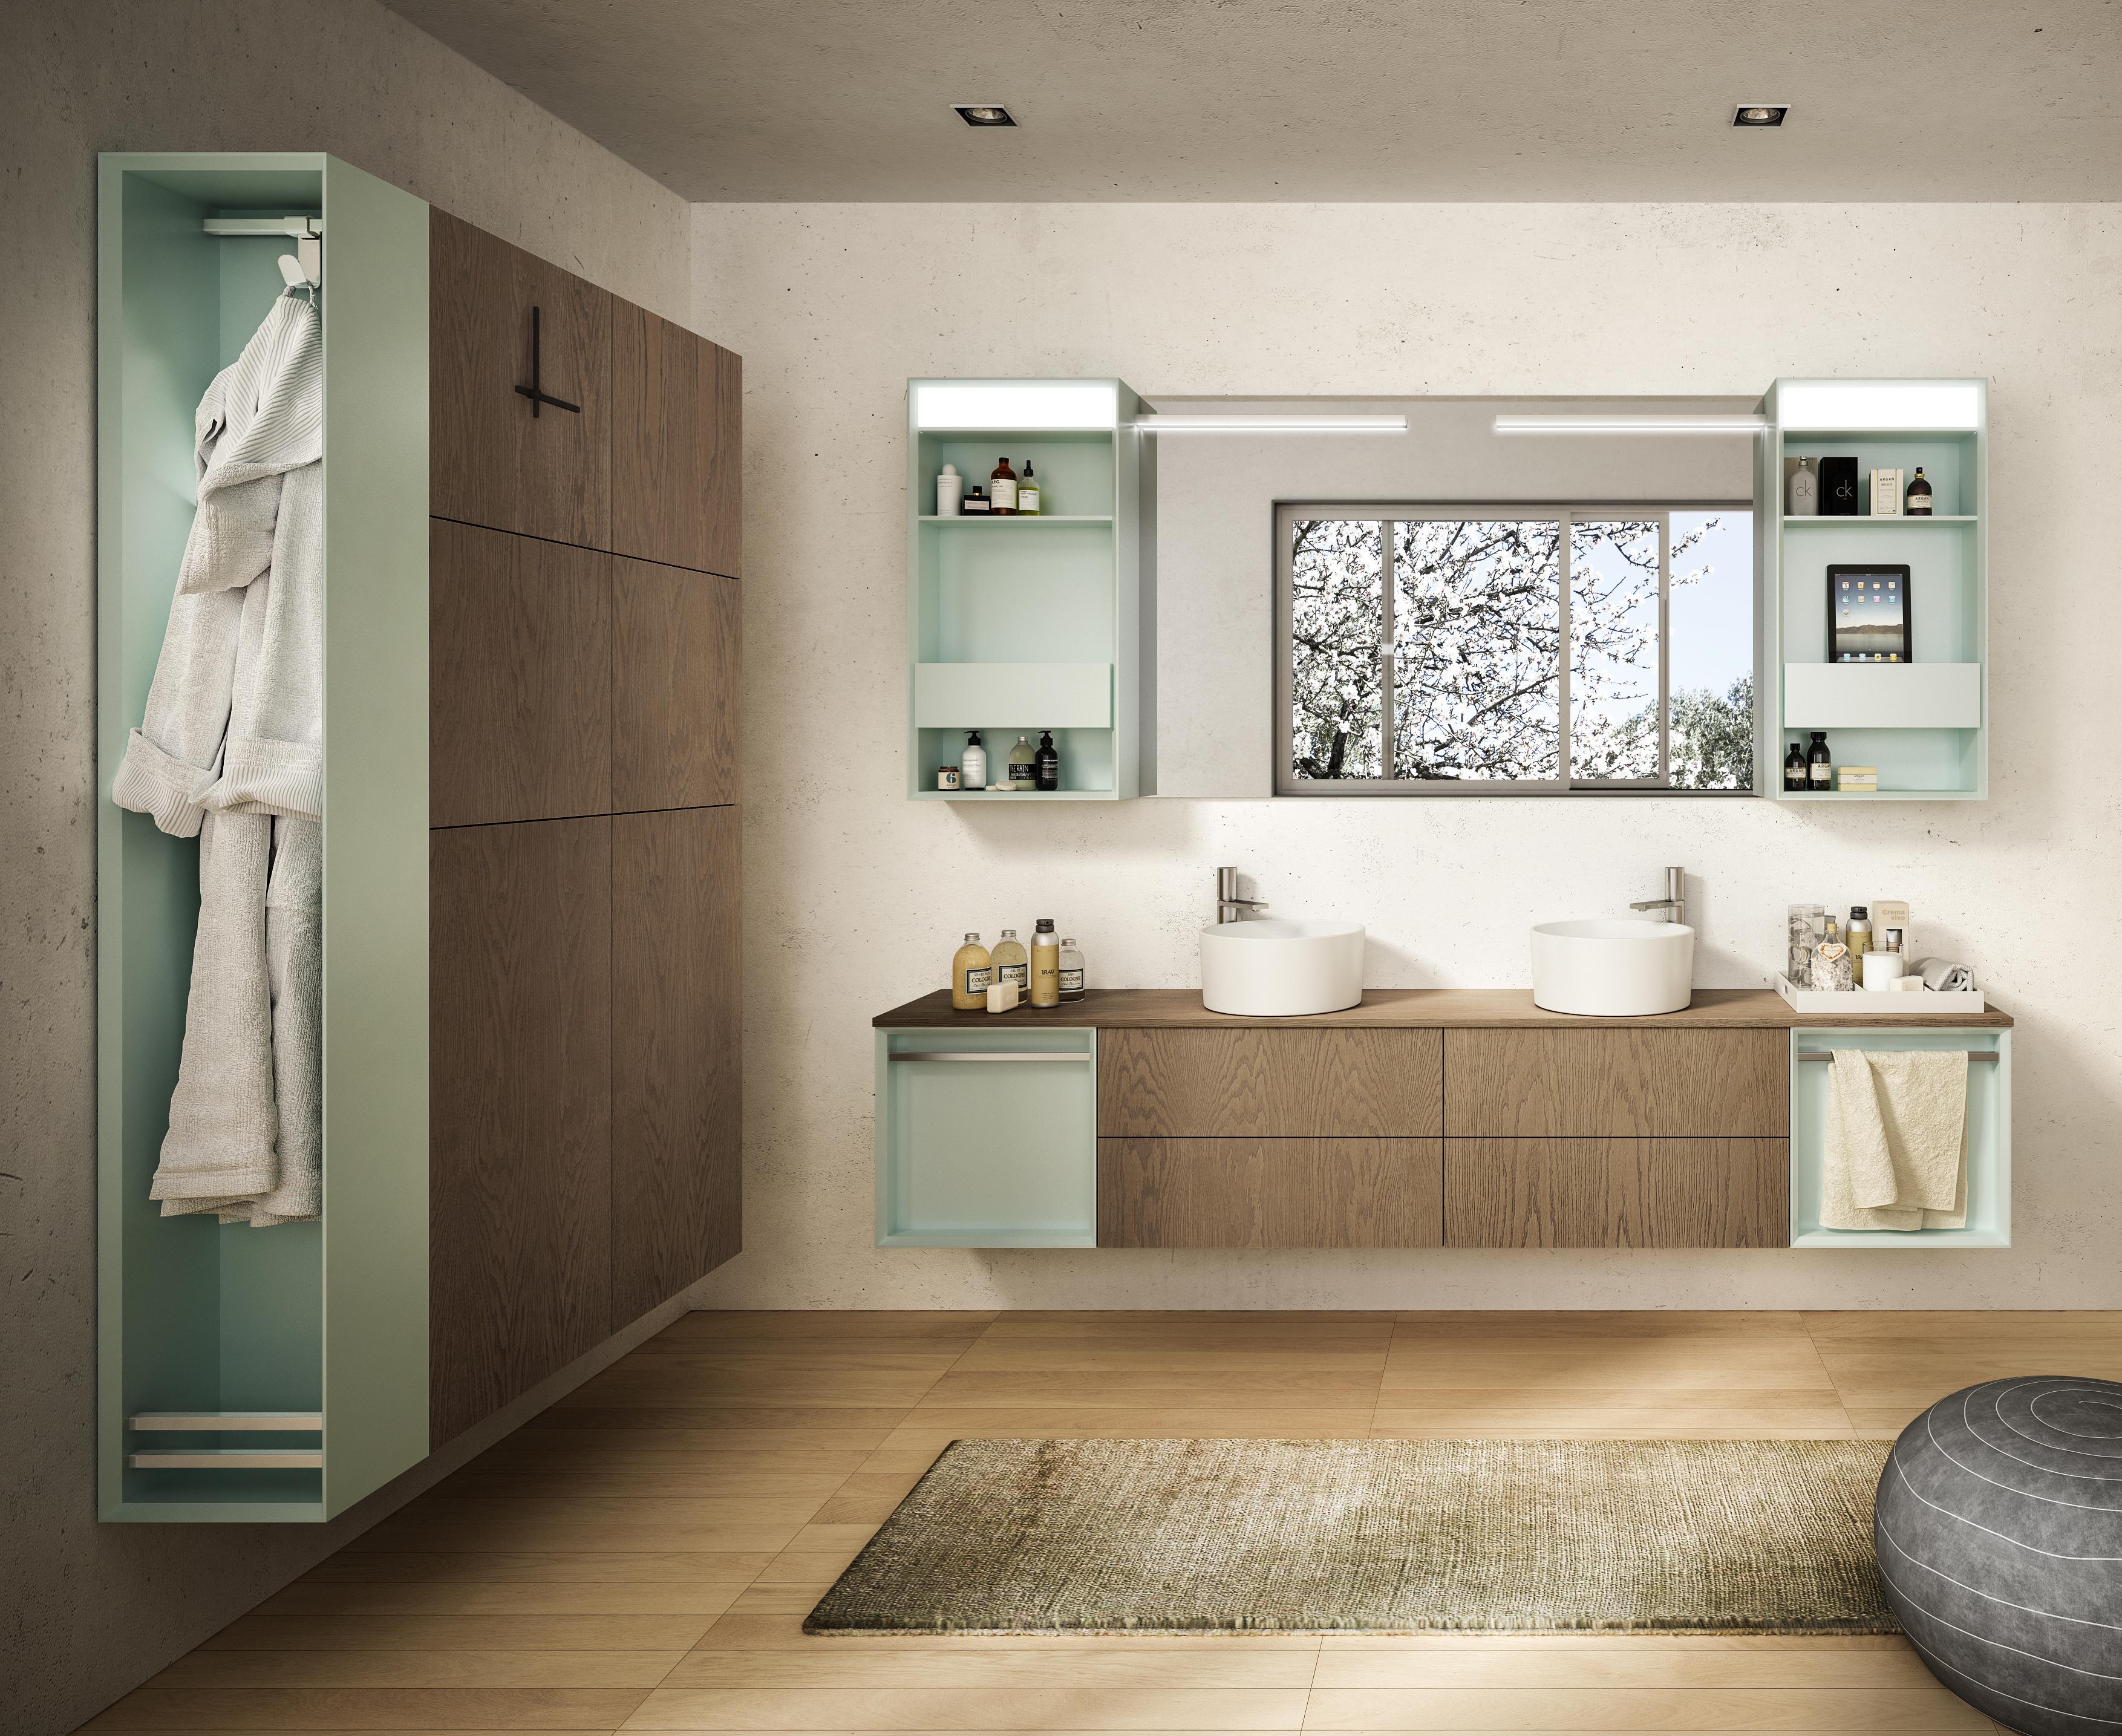 Vasca Da Bagno Kami Scavolini : Mobili bagno artesi prezzi great mobili tosi arredo bagno artesi